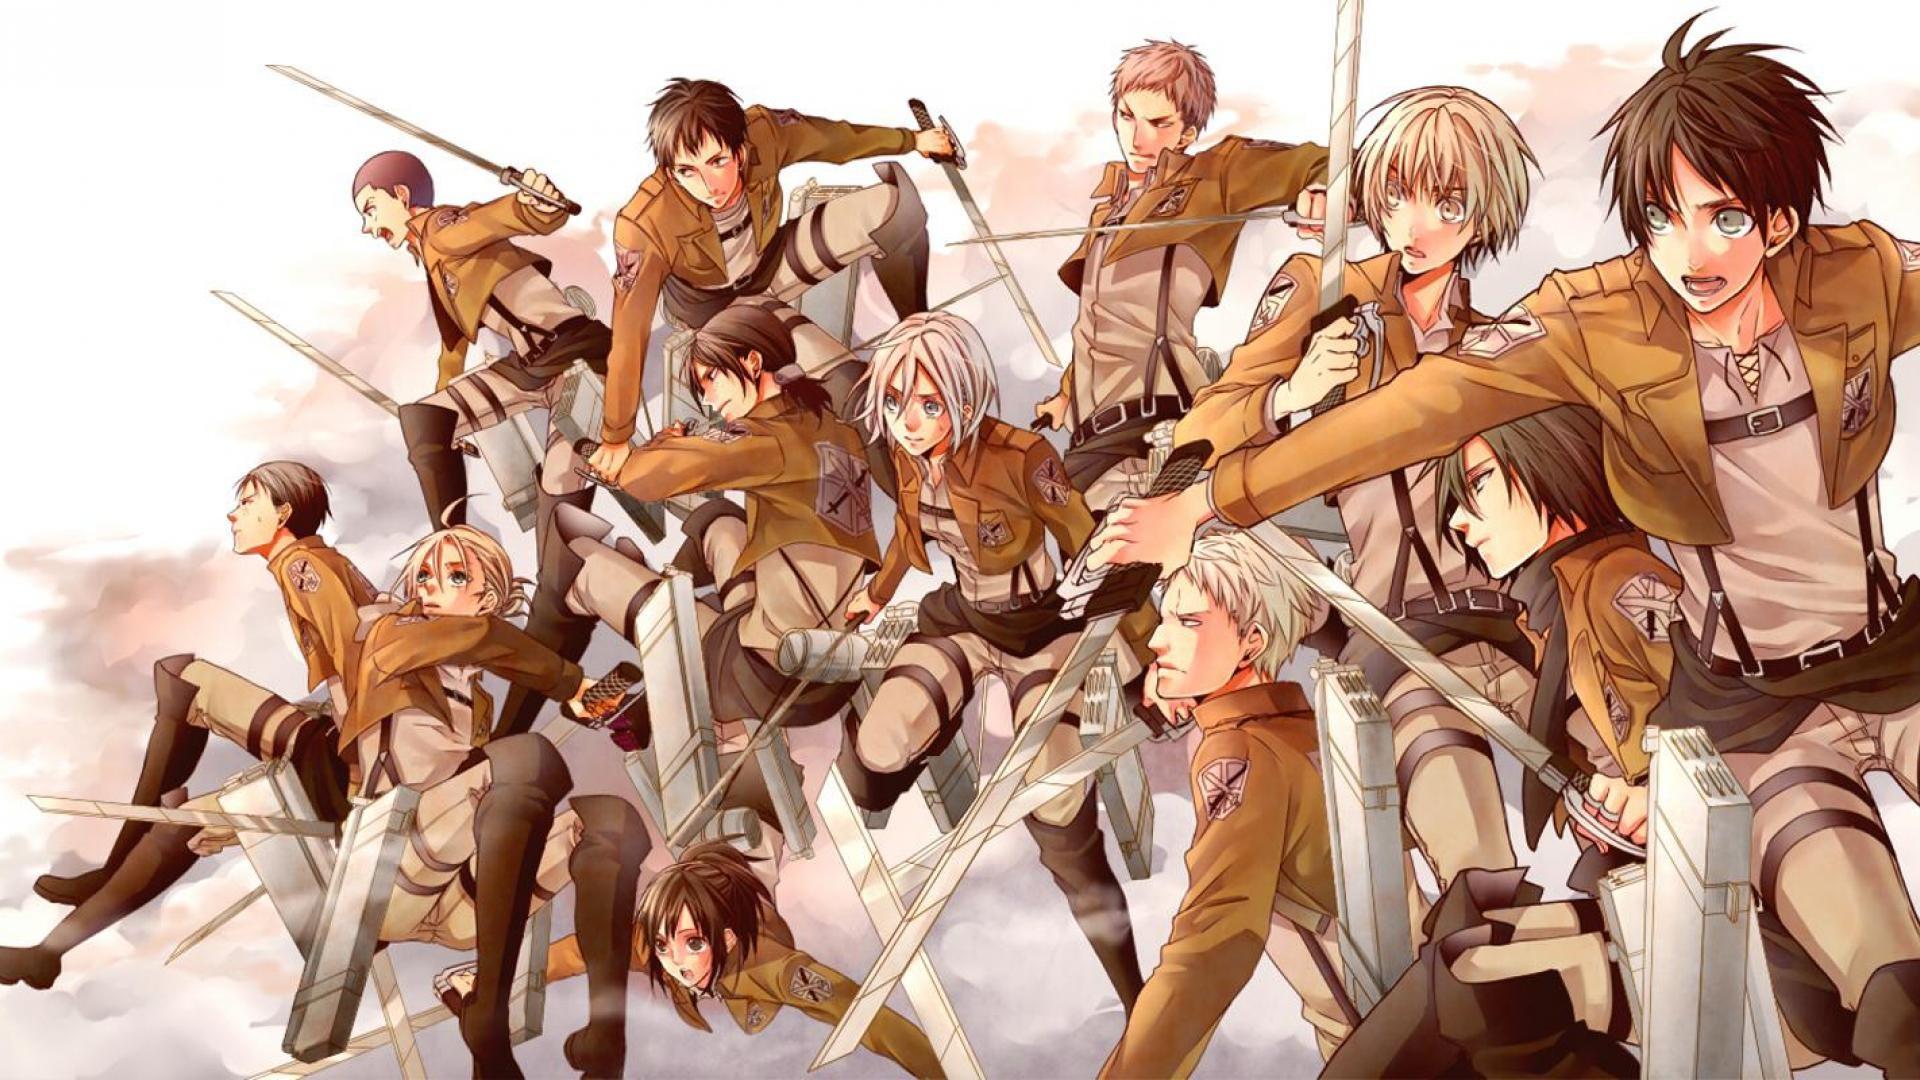 Attack On Titan Wallpaper Hd Picture Gallery .